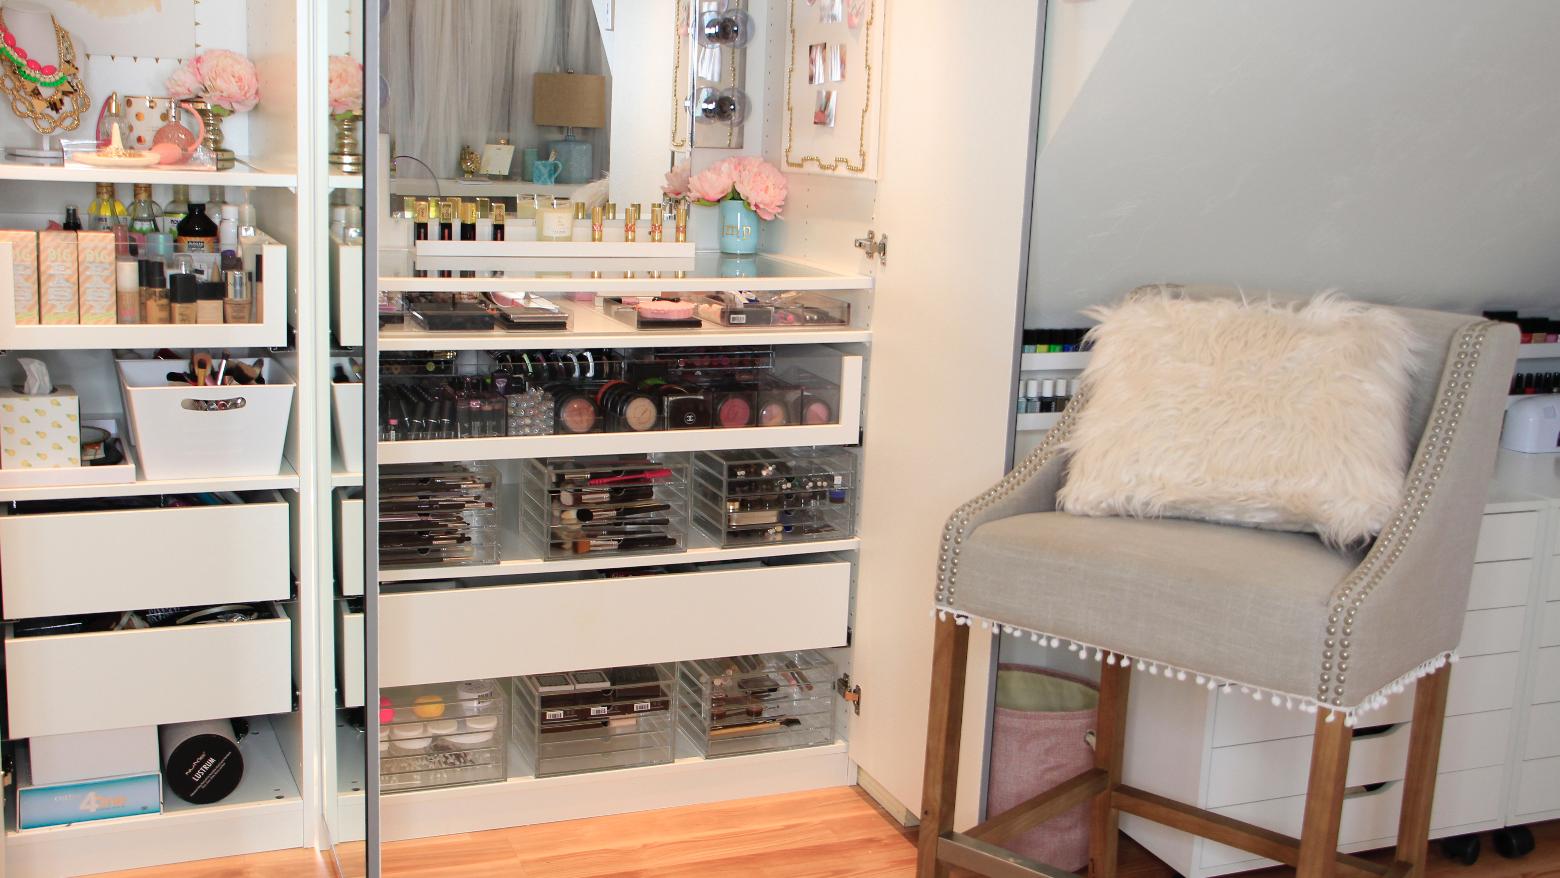 Attractive Dose Of Lisa Pullano: ♡My Makeup Tour U0026 Storage Ideas♡